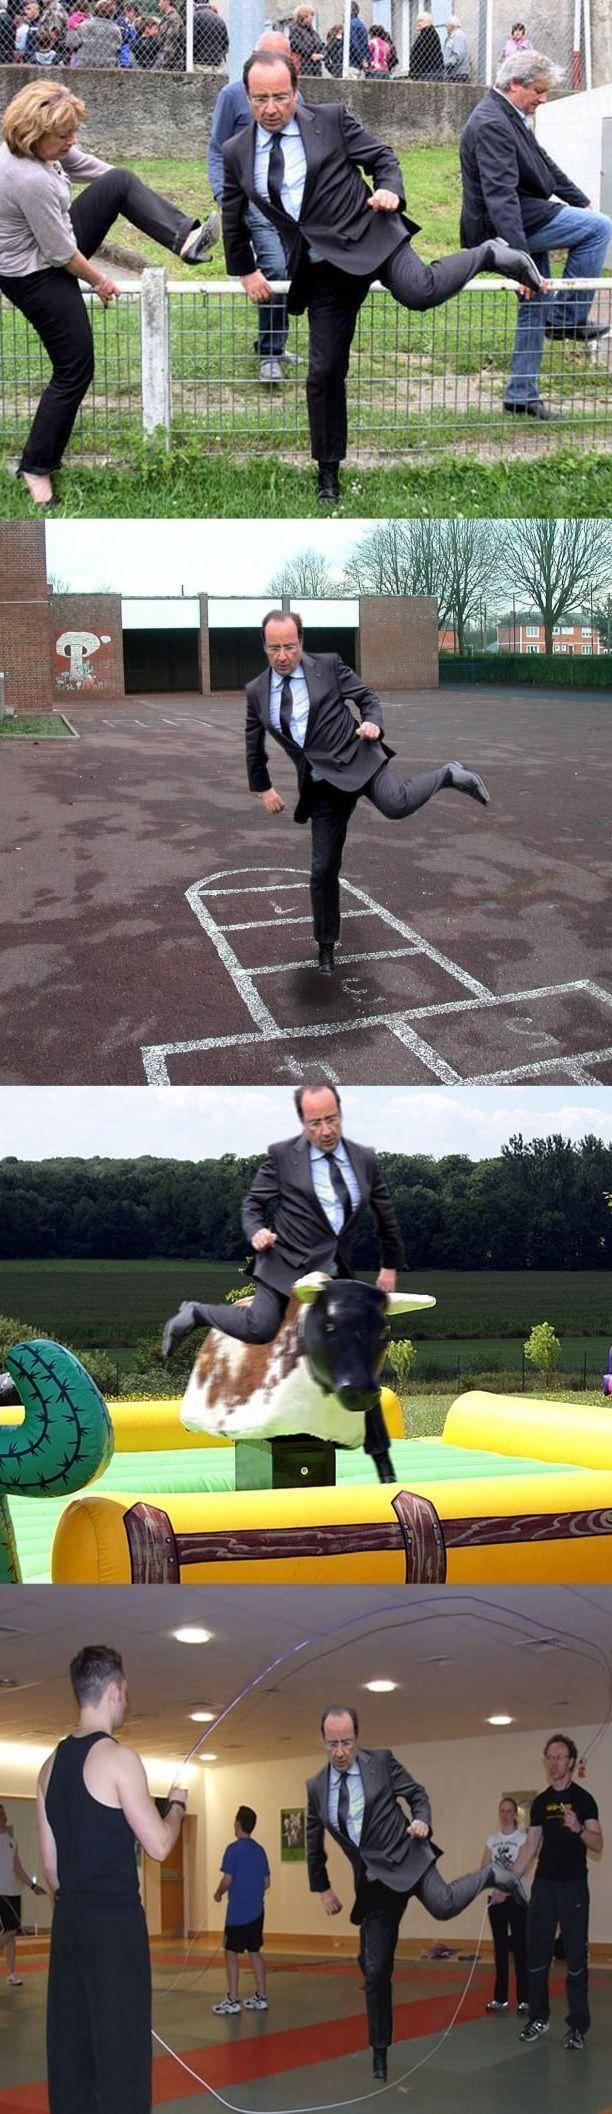 voila Francois Hollande de bloquer